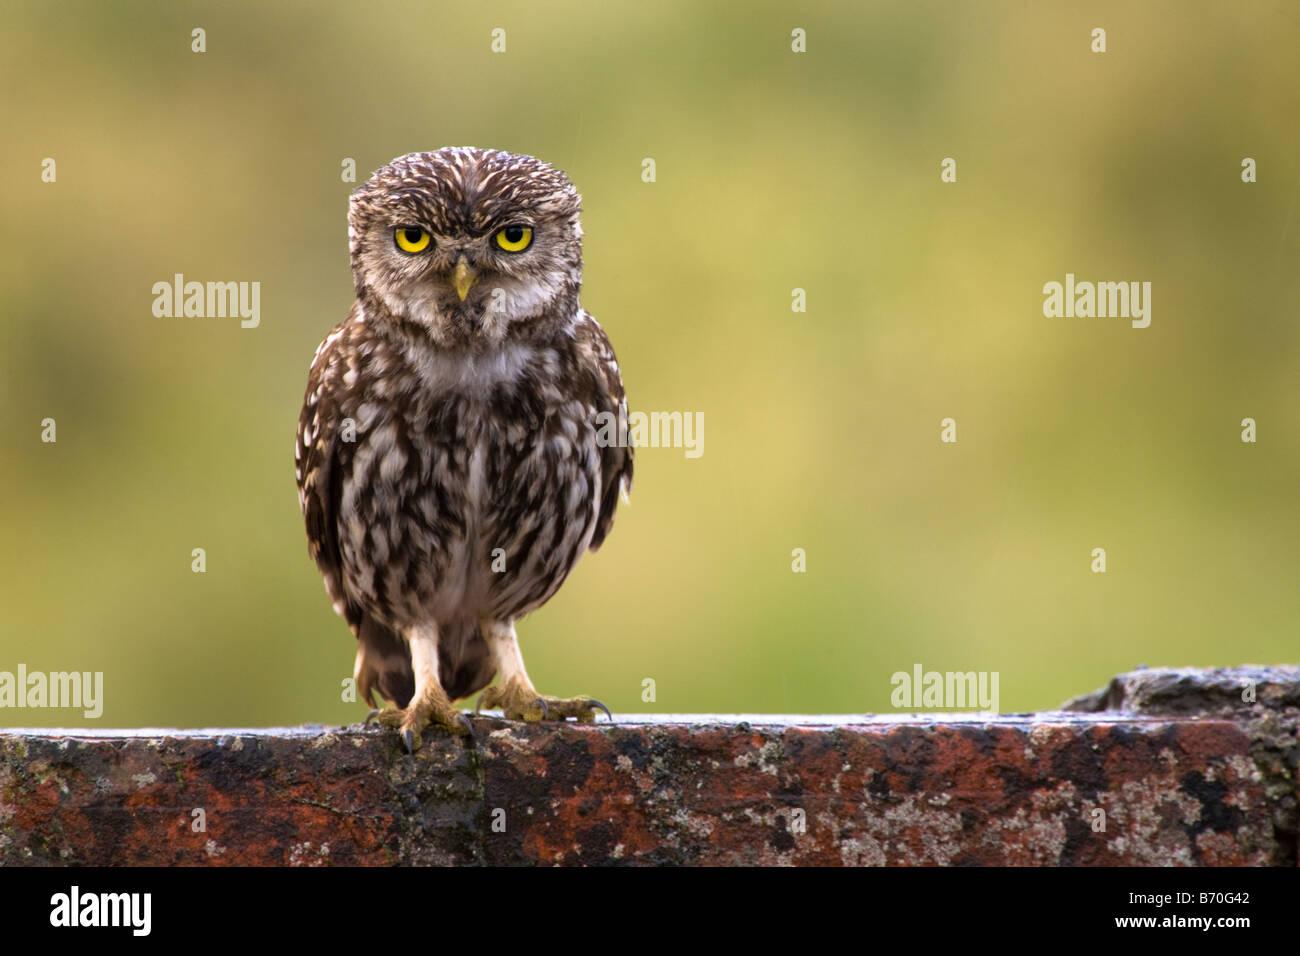 Little Owl,Athene noctua on a wood stick looking backward at Pego da Granja,Loures,Portugal Stock Photo